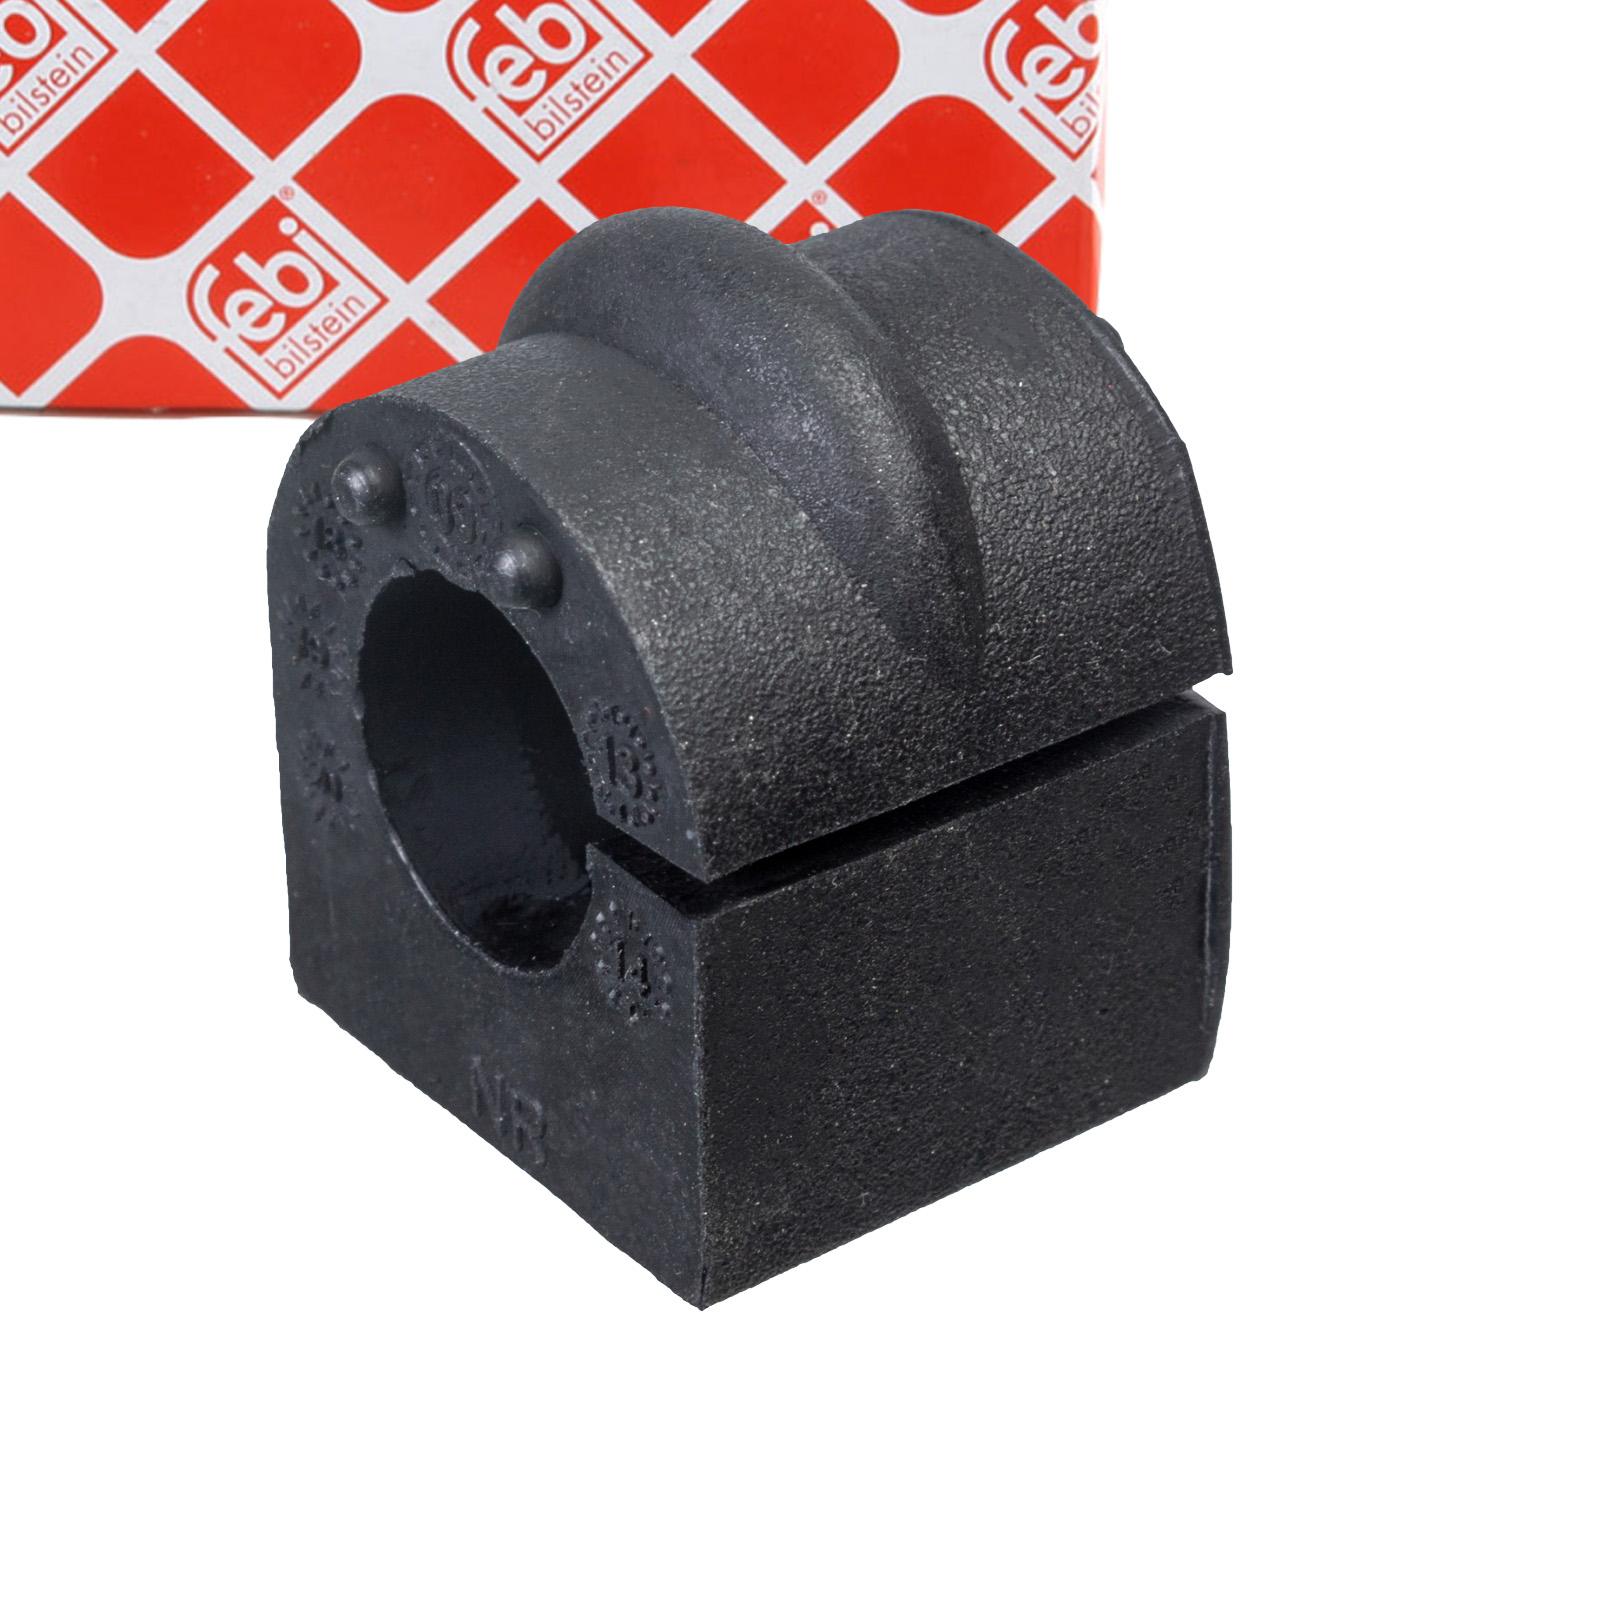 2x FEBI 108170 Stabilisatorlager MERCEDES 190 W201 W169 W202 W124 W210 hinten 1243260181